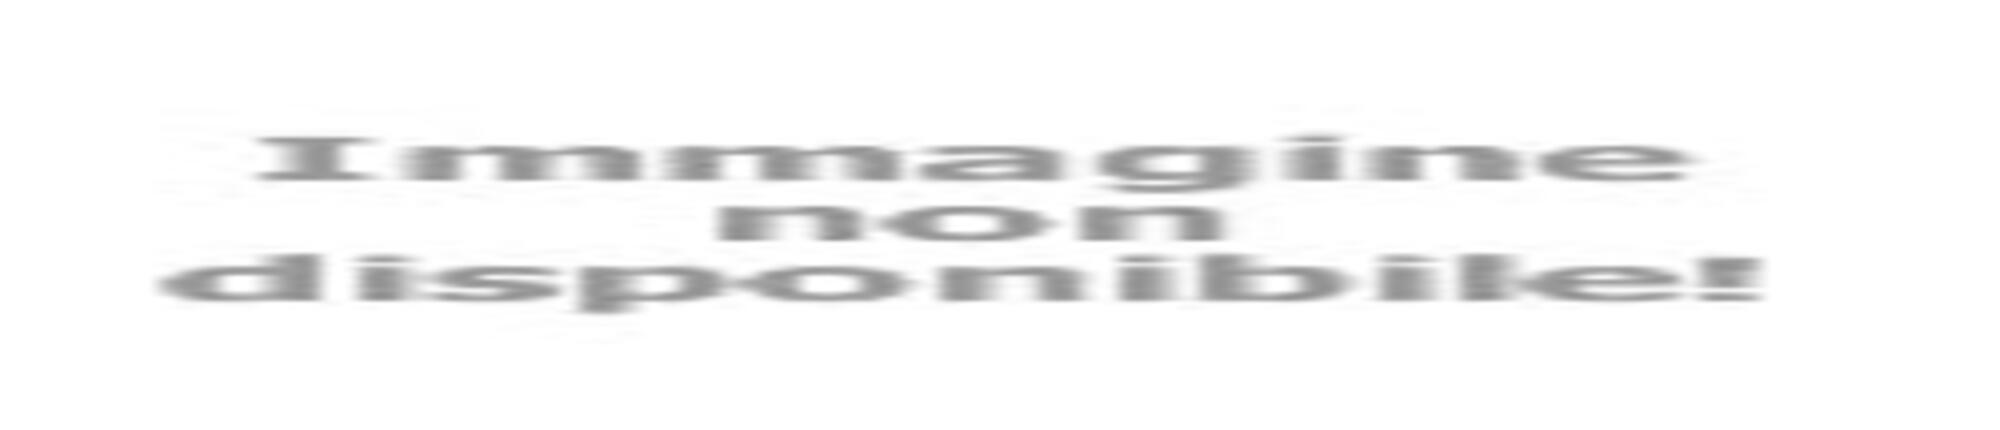 Italian Bike Festival à Rimini : c'est parti!